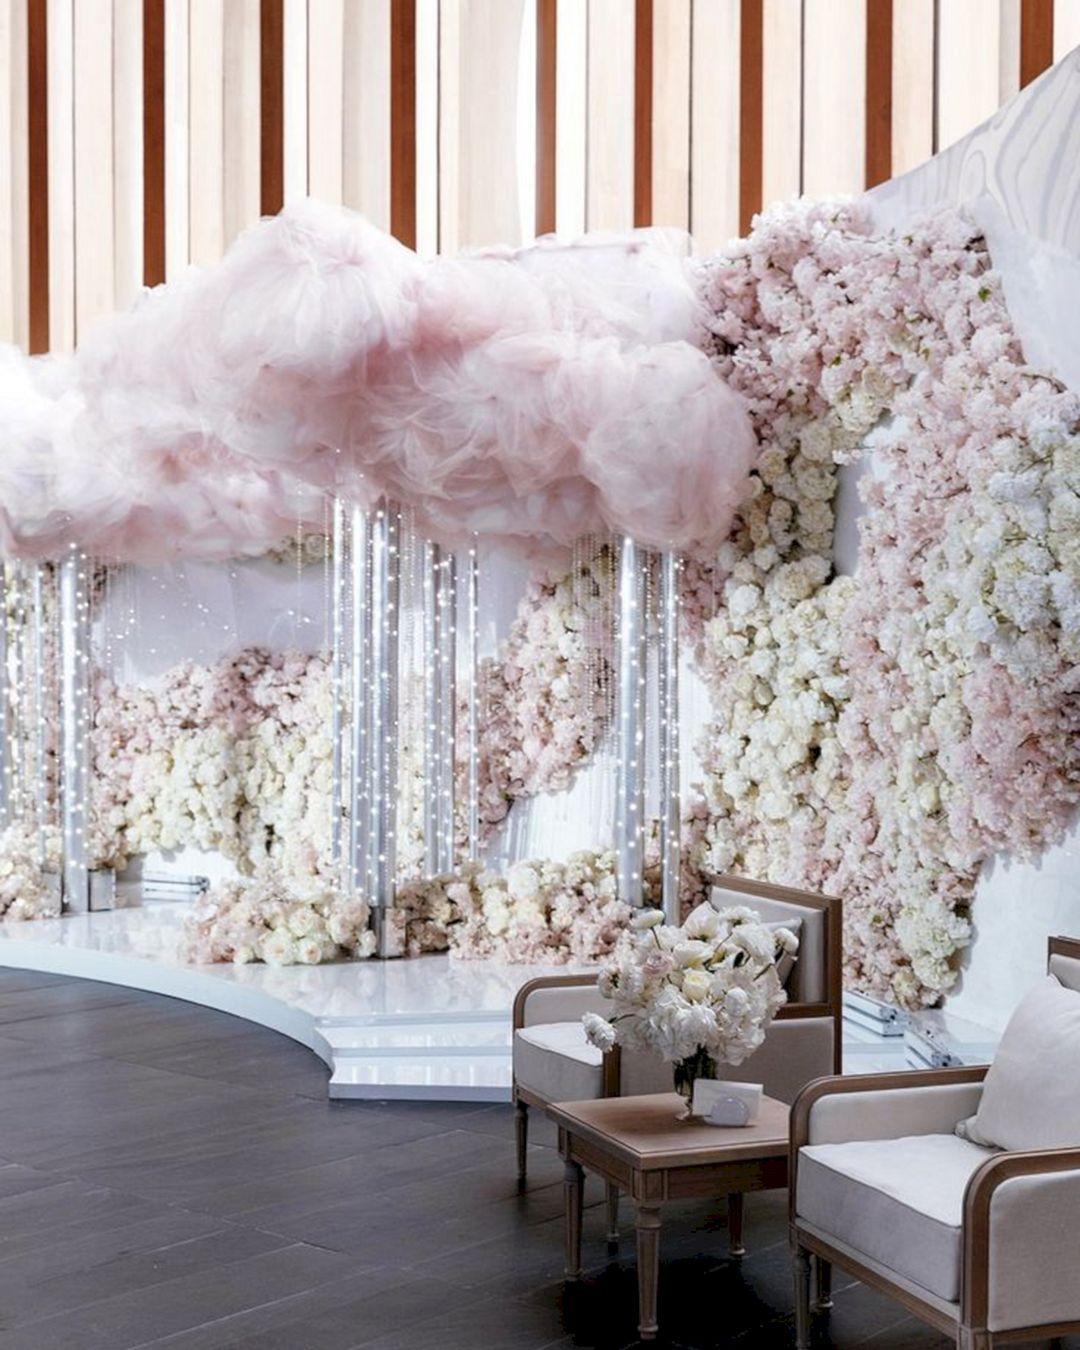 15 Luxury Wedding Backdrop Ideas Ideas You Must Try Wedding Backdrop Design Wedding Backdrop Wedding Dresses With Flowers Luxury bridal room decoration